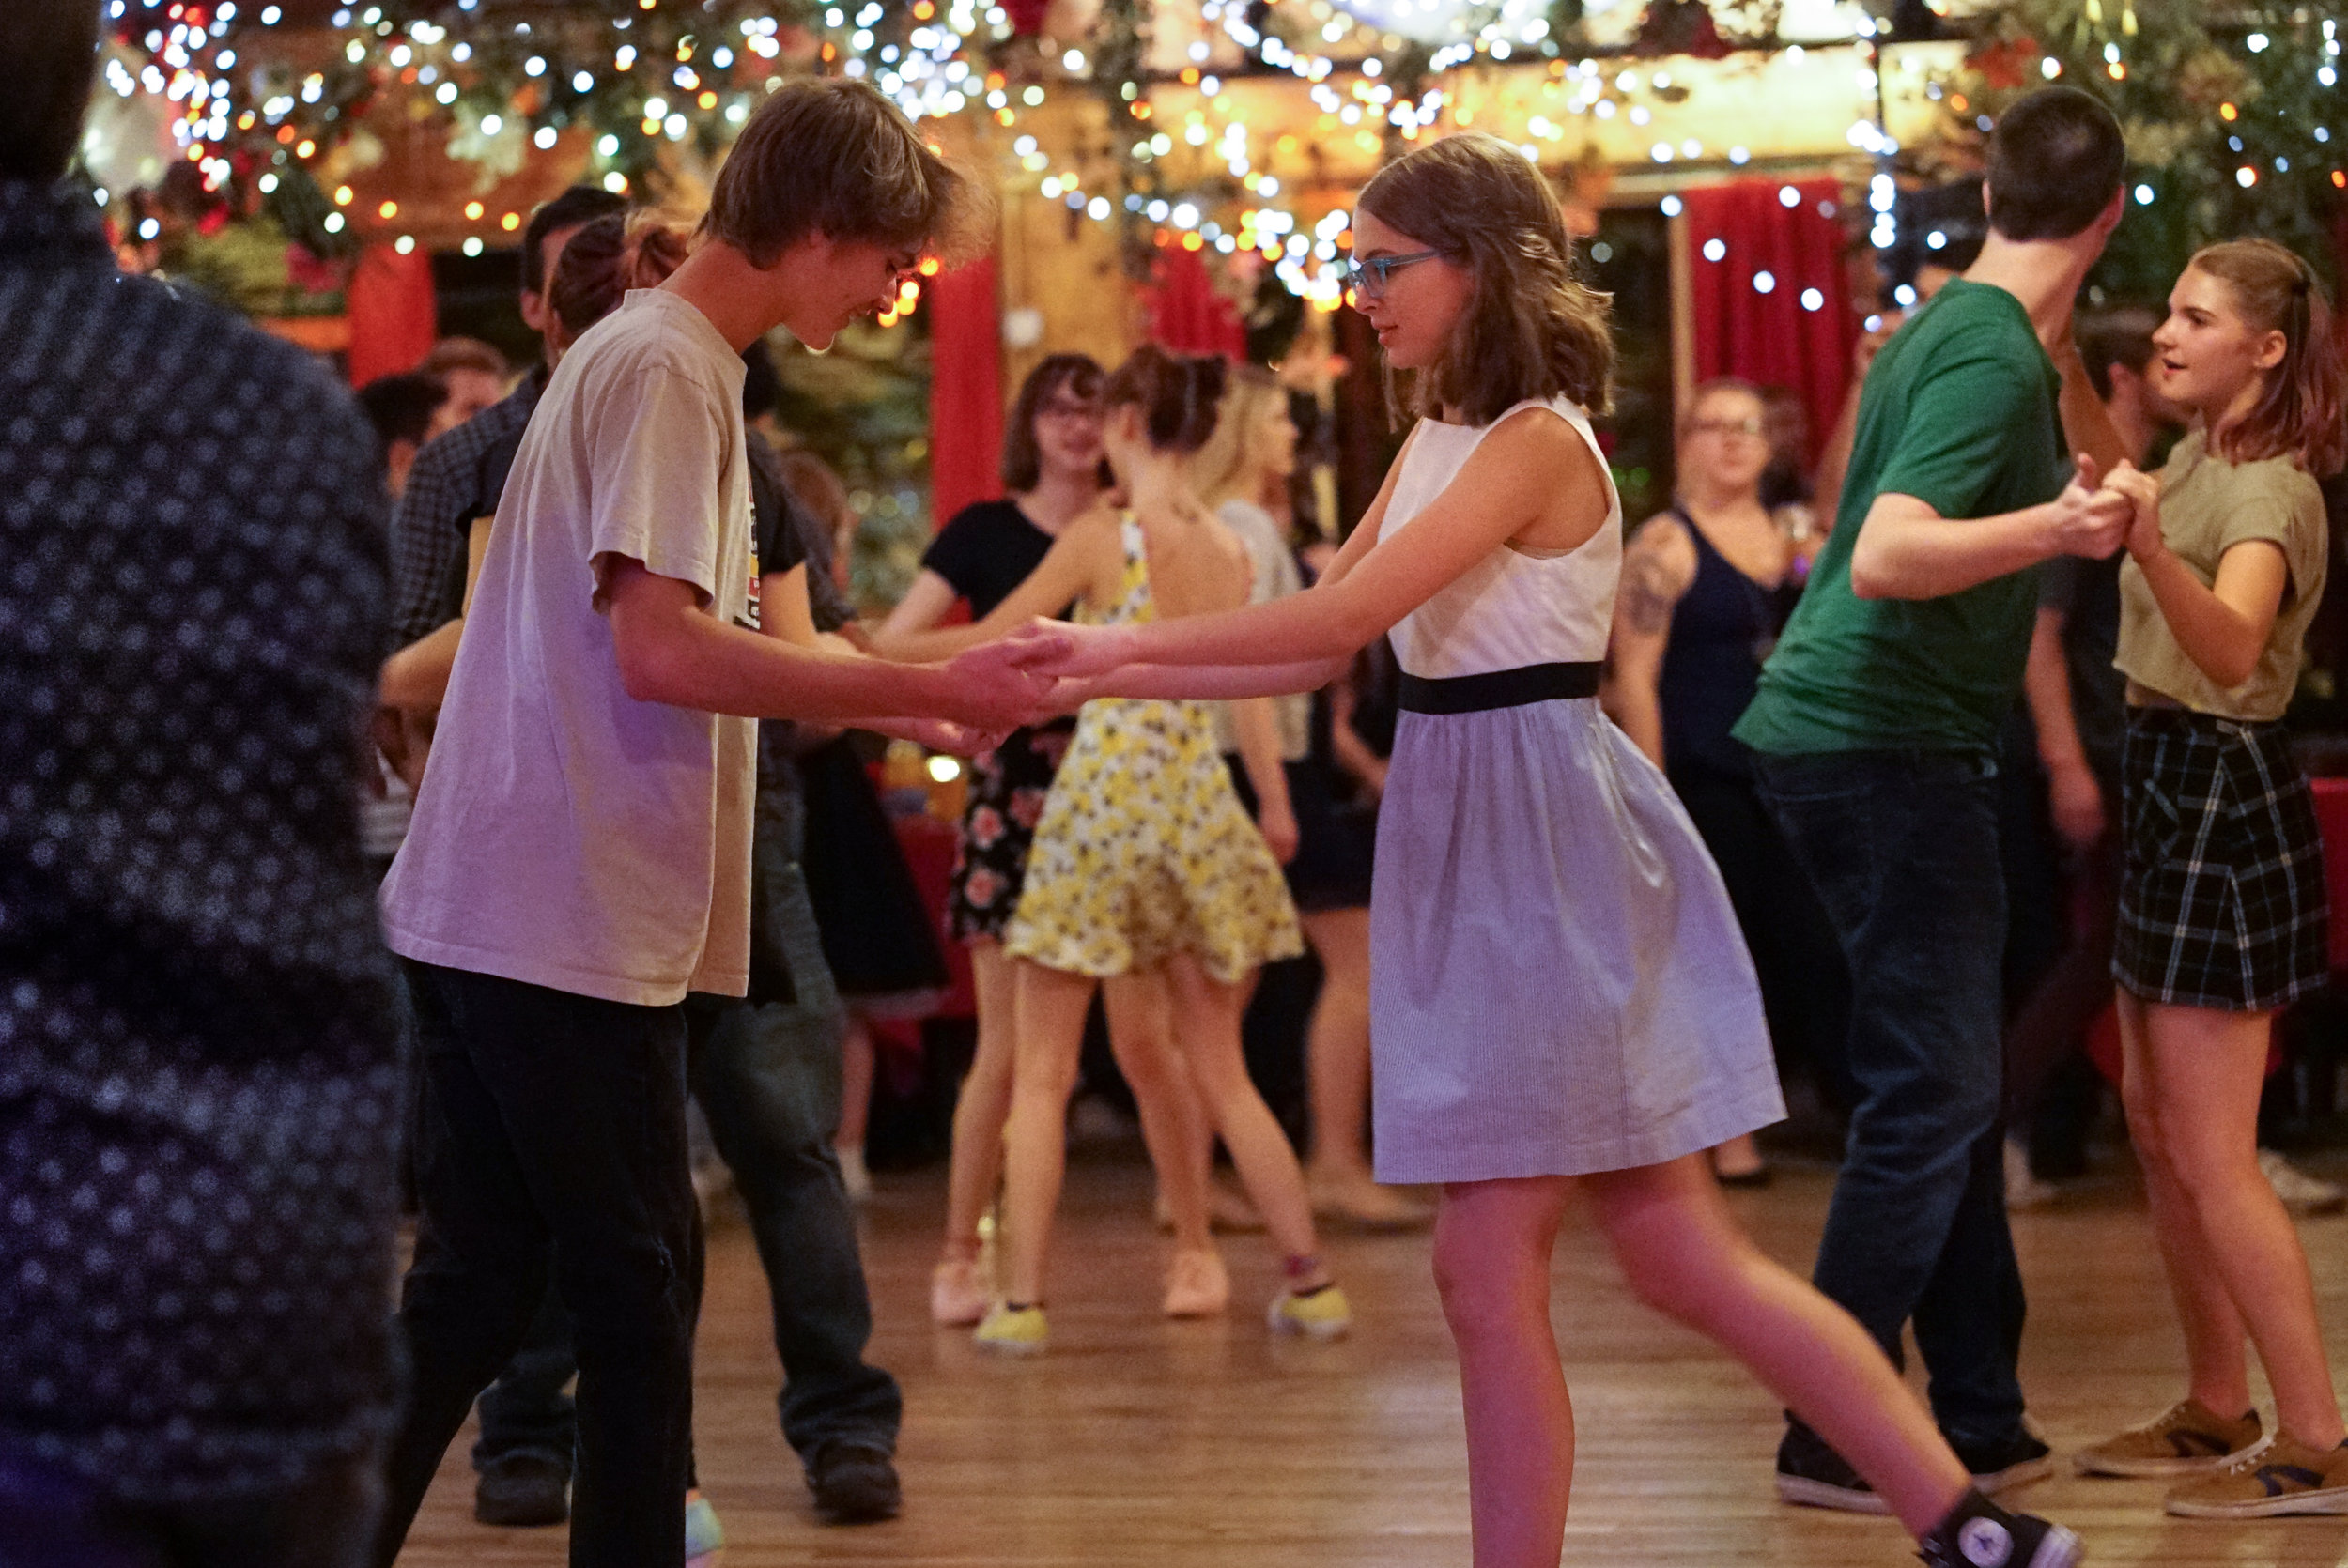 Inter-generational Dance!